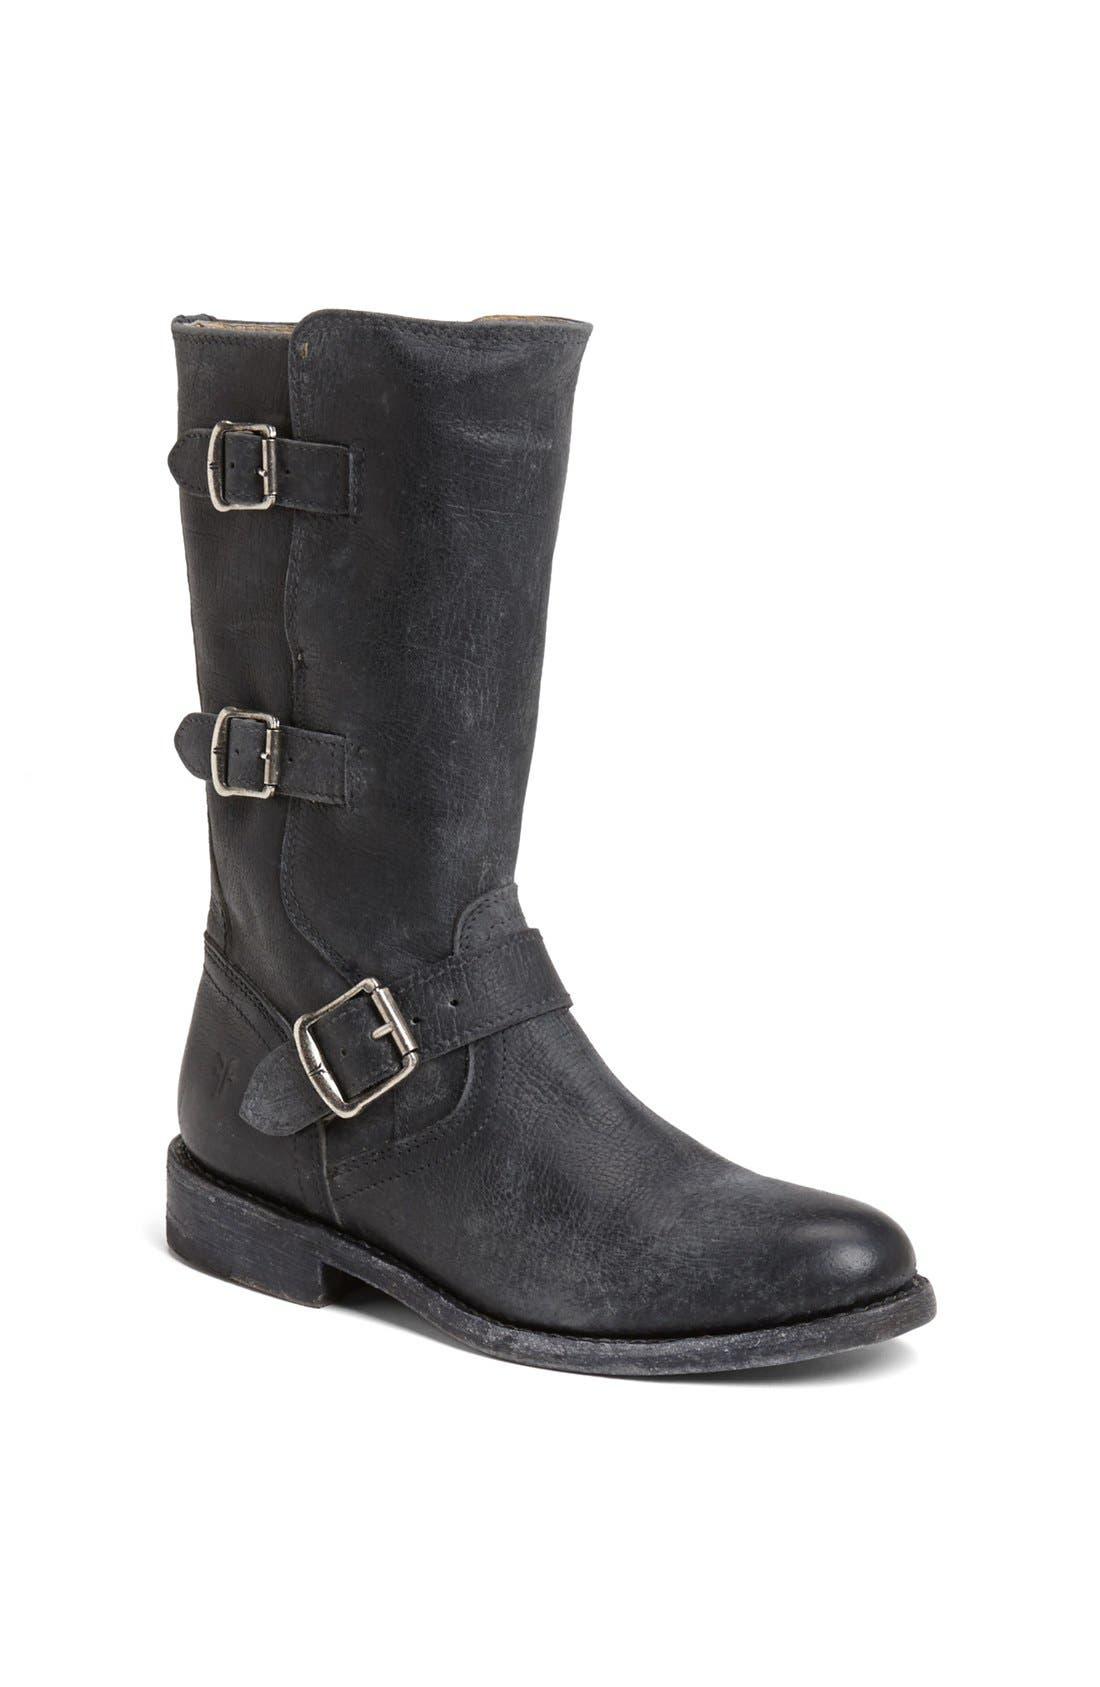 'Jayden' Leather Moto Boot,                             Main thumbnail 1, color,                             001